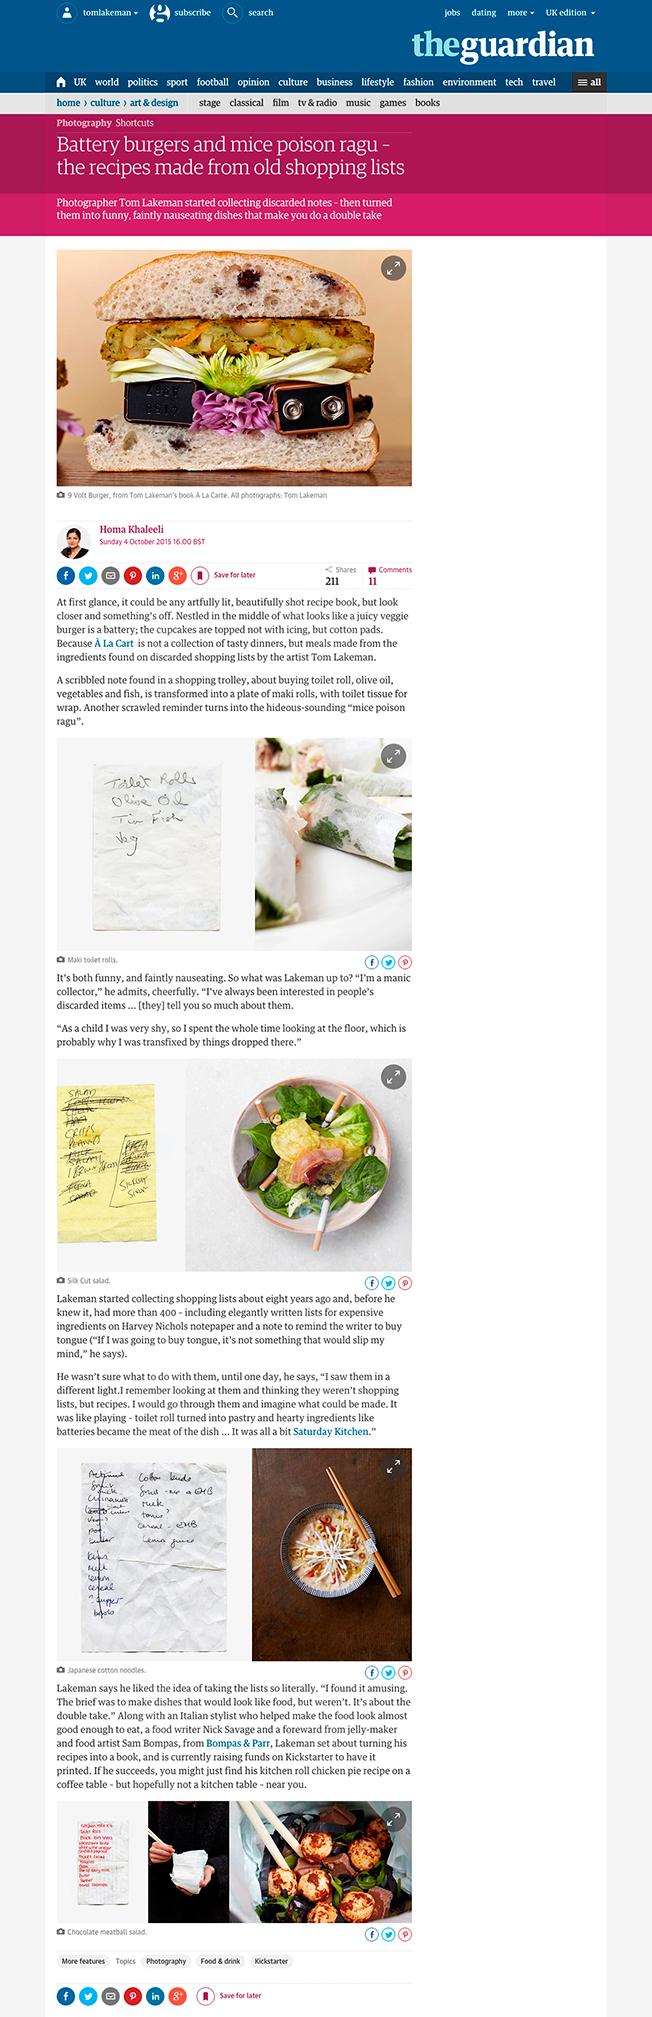 Online + Print